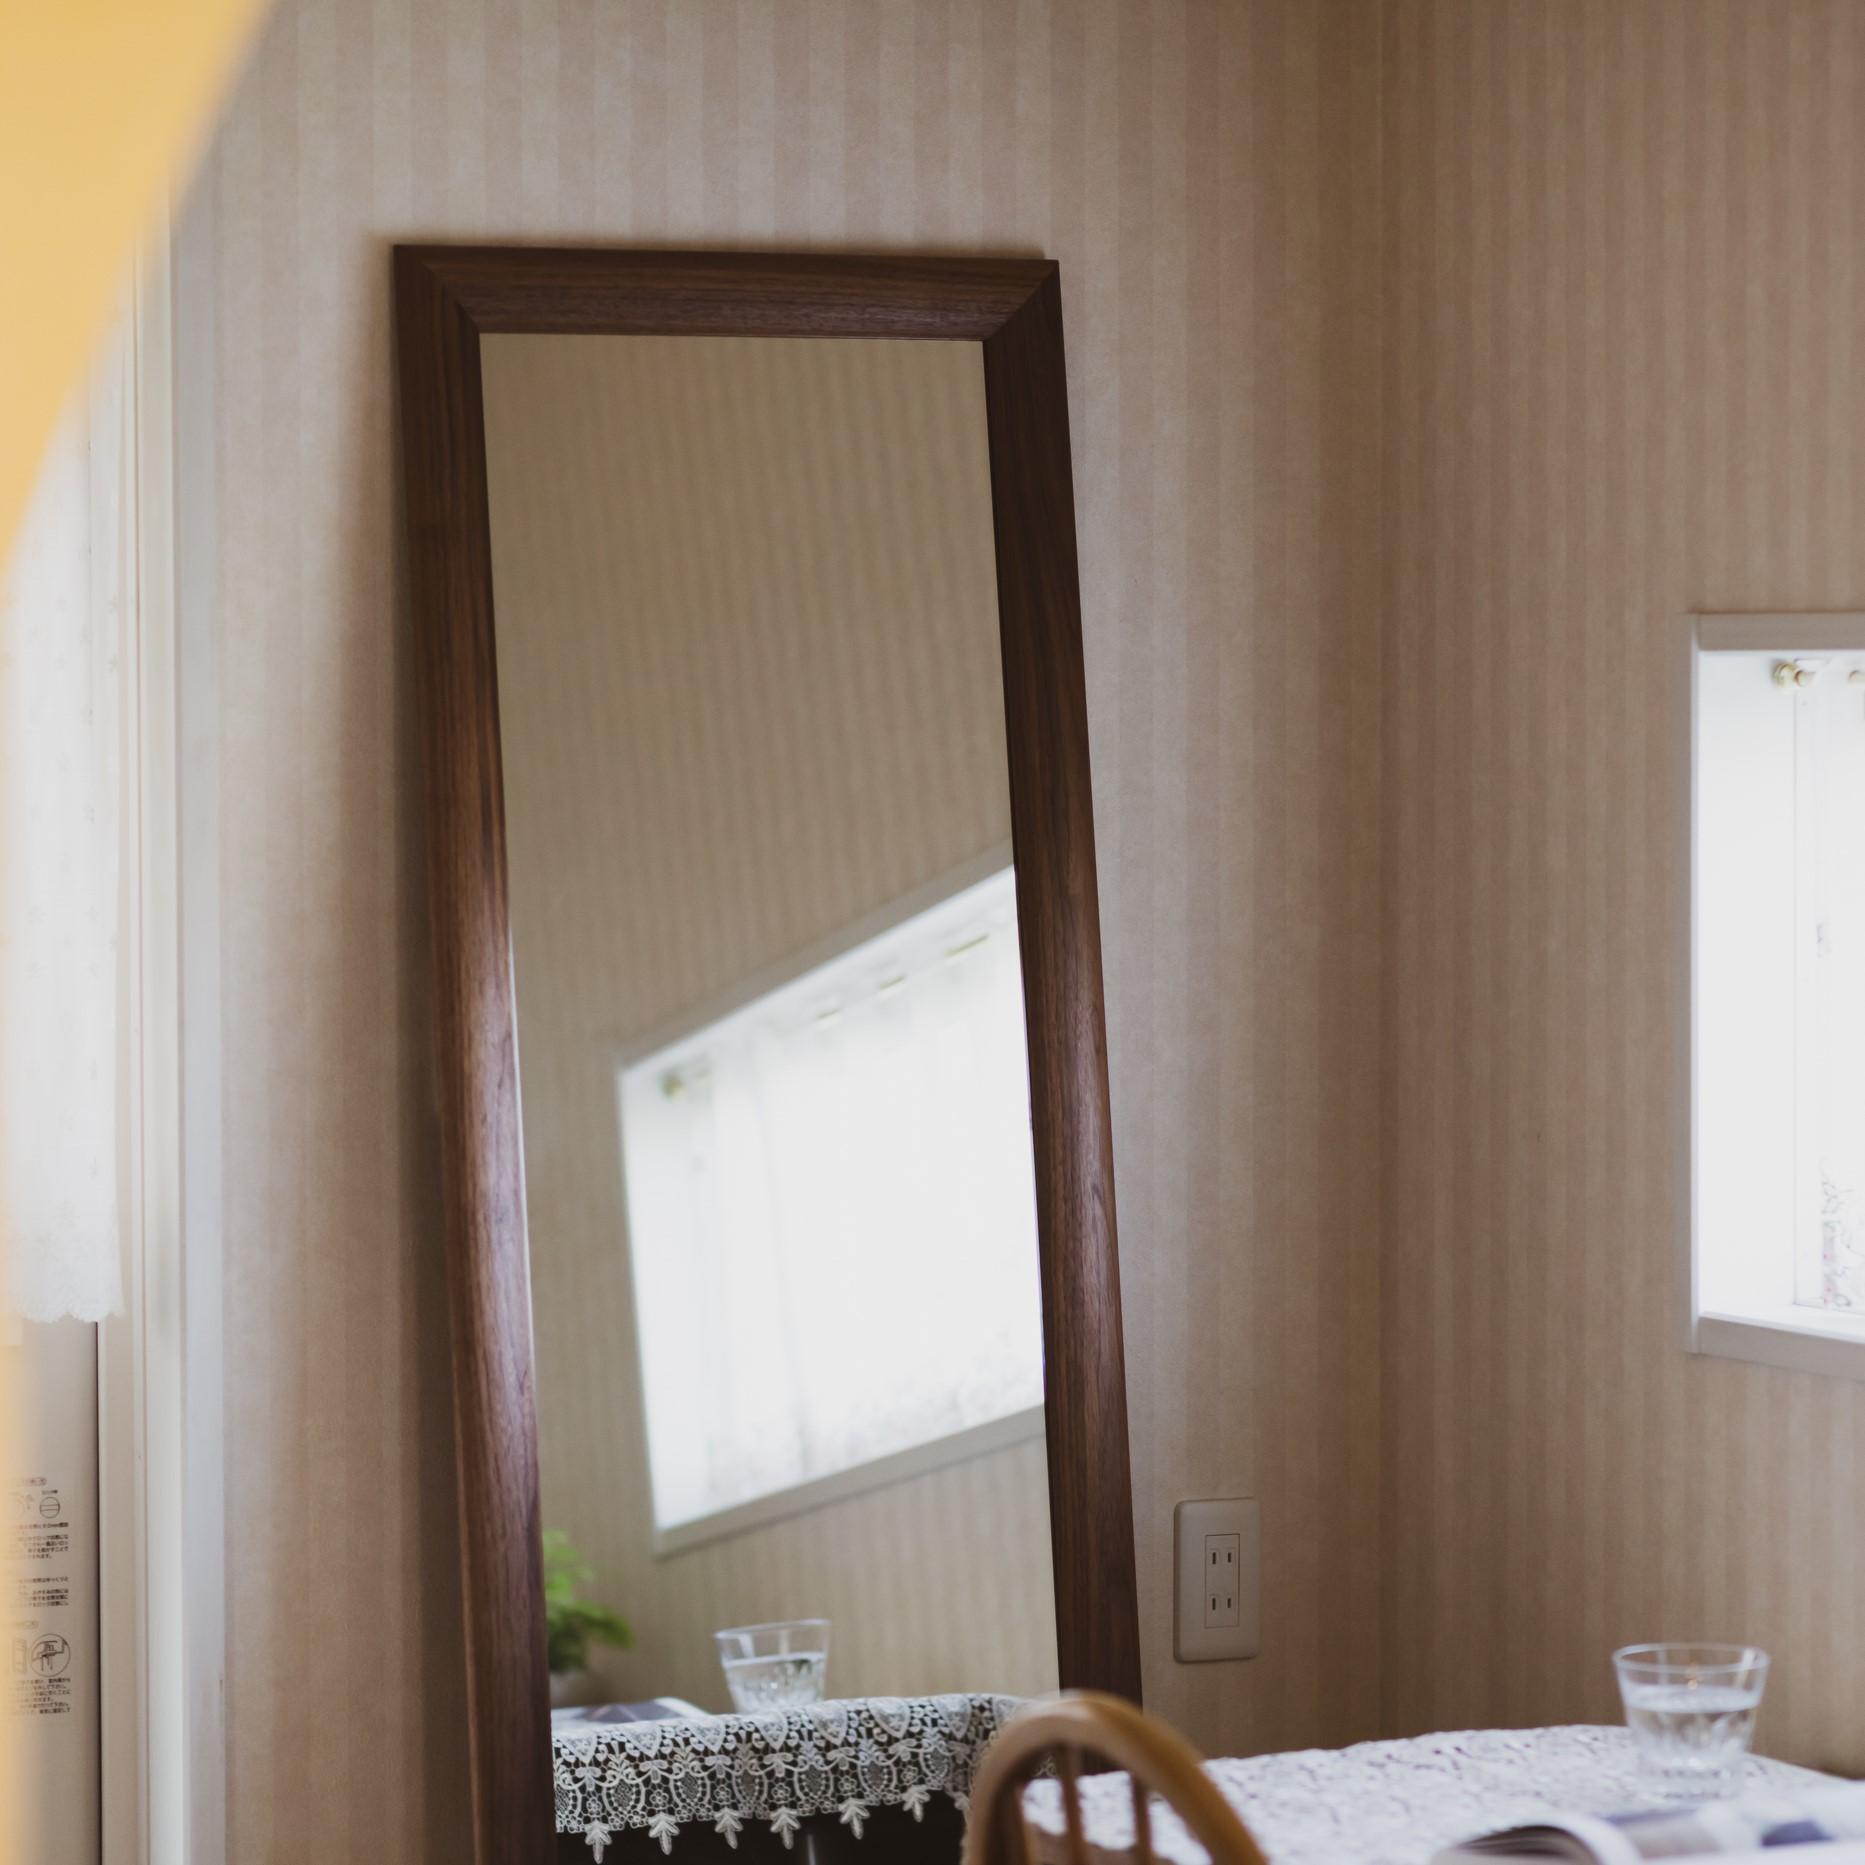 SOL ソル 59x161cm ウォールナット材 姿見 壁掛けミラー 全身鏡 (大型商品)